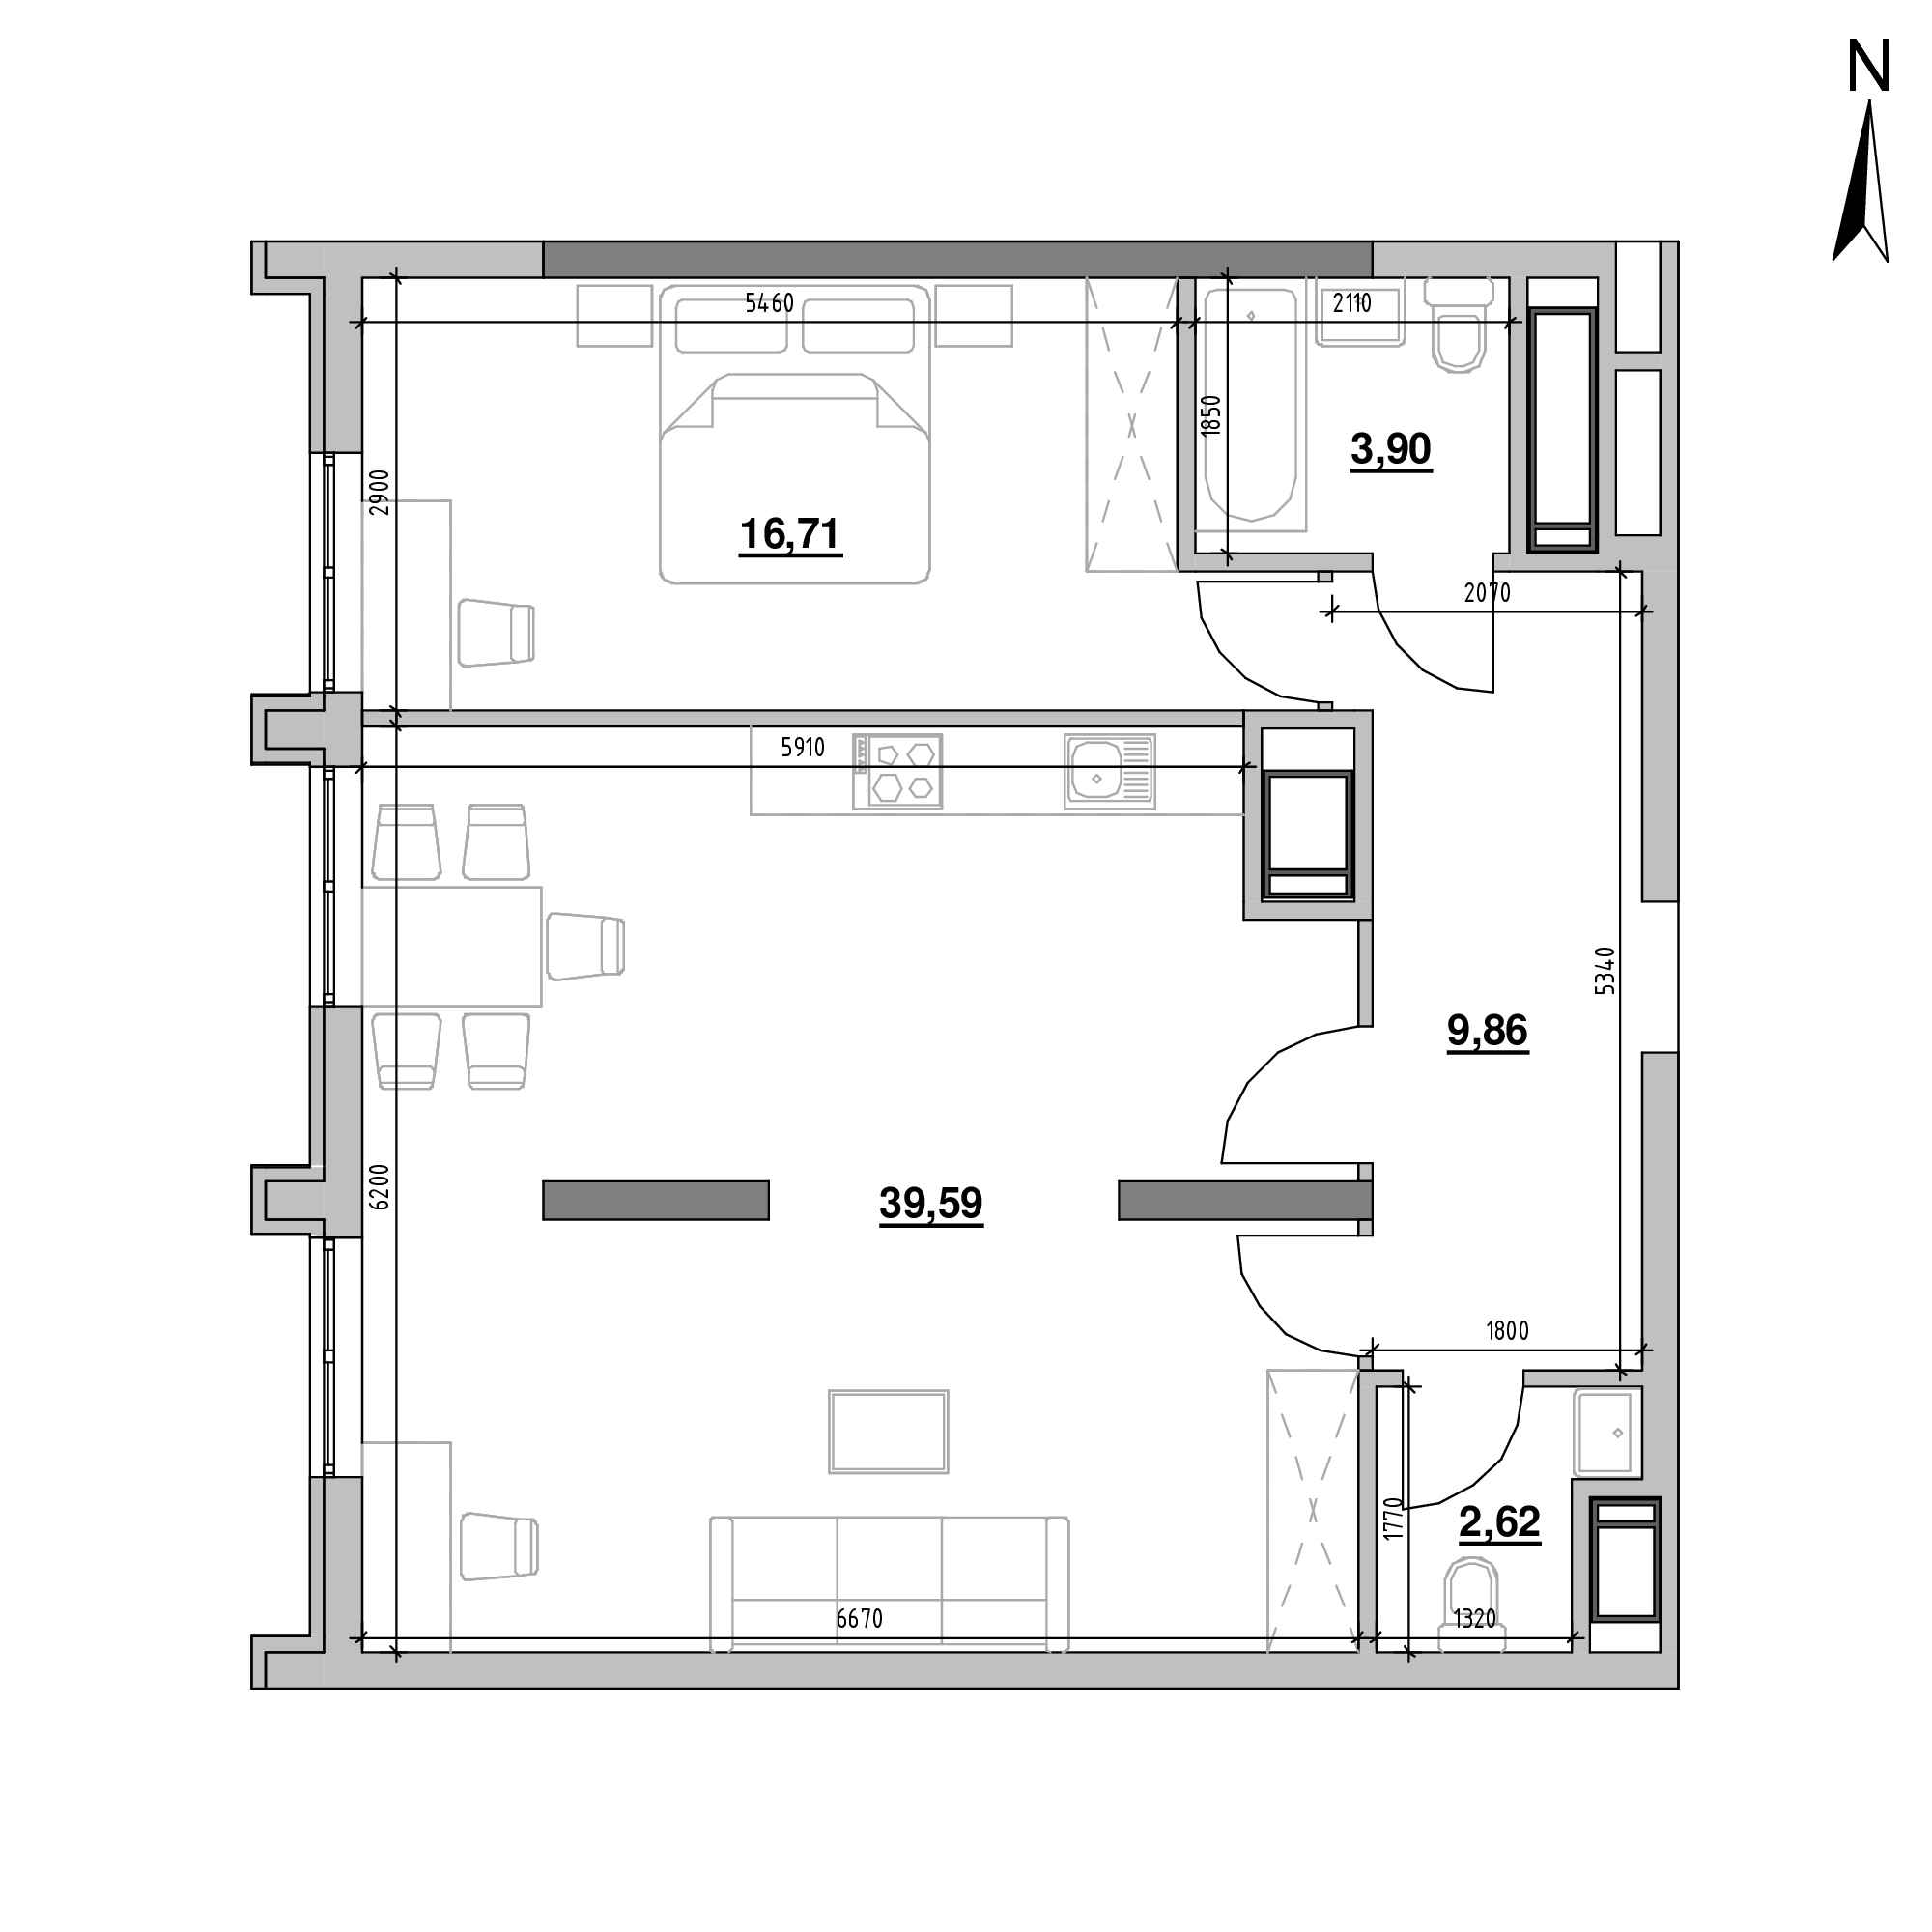 ЖК Nordica Residence: планування 1-кімнатної квартири, №104, 72.68 м<sup>2</sup>